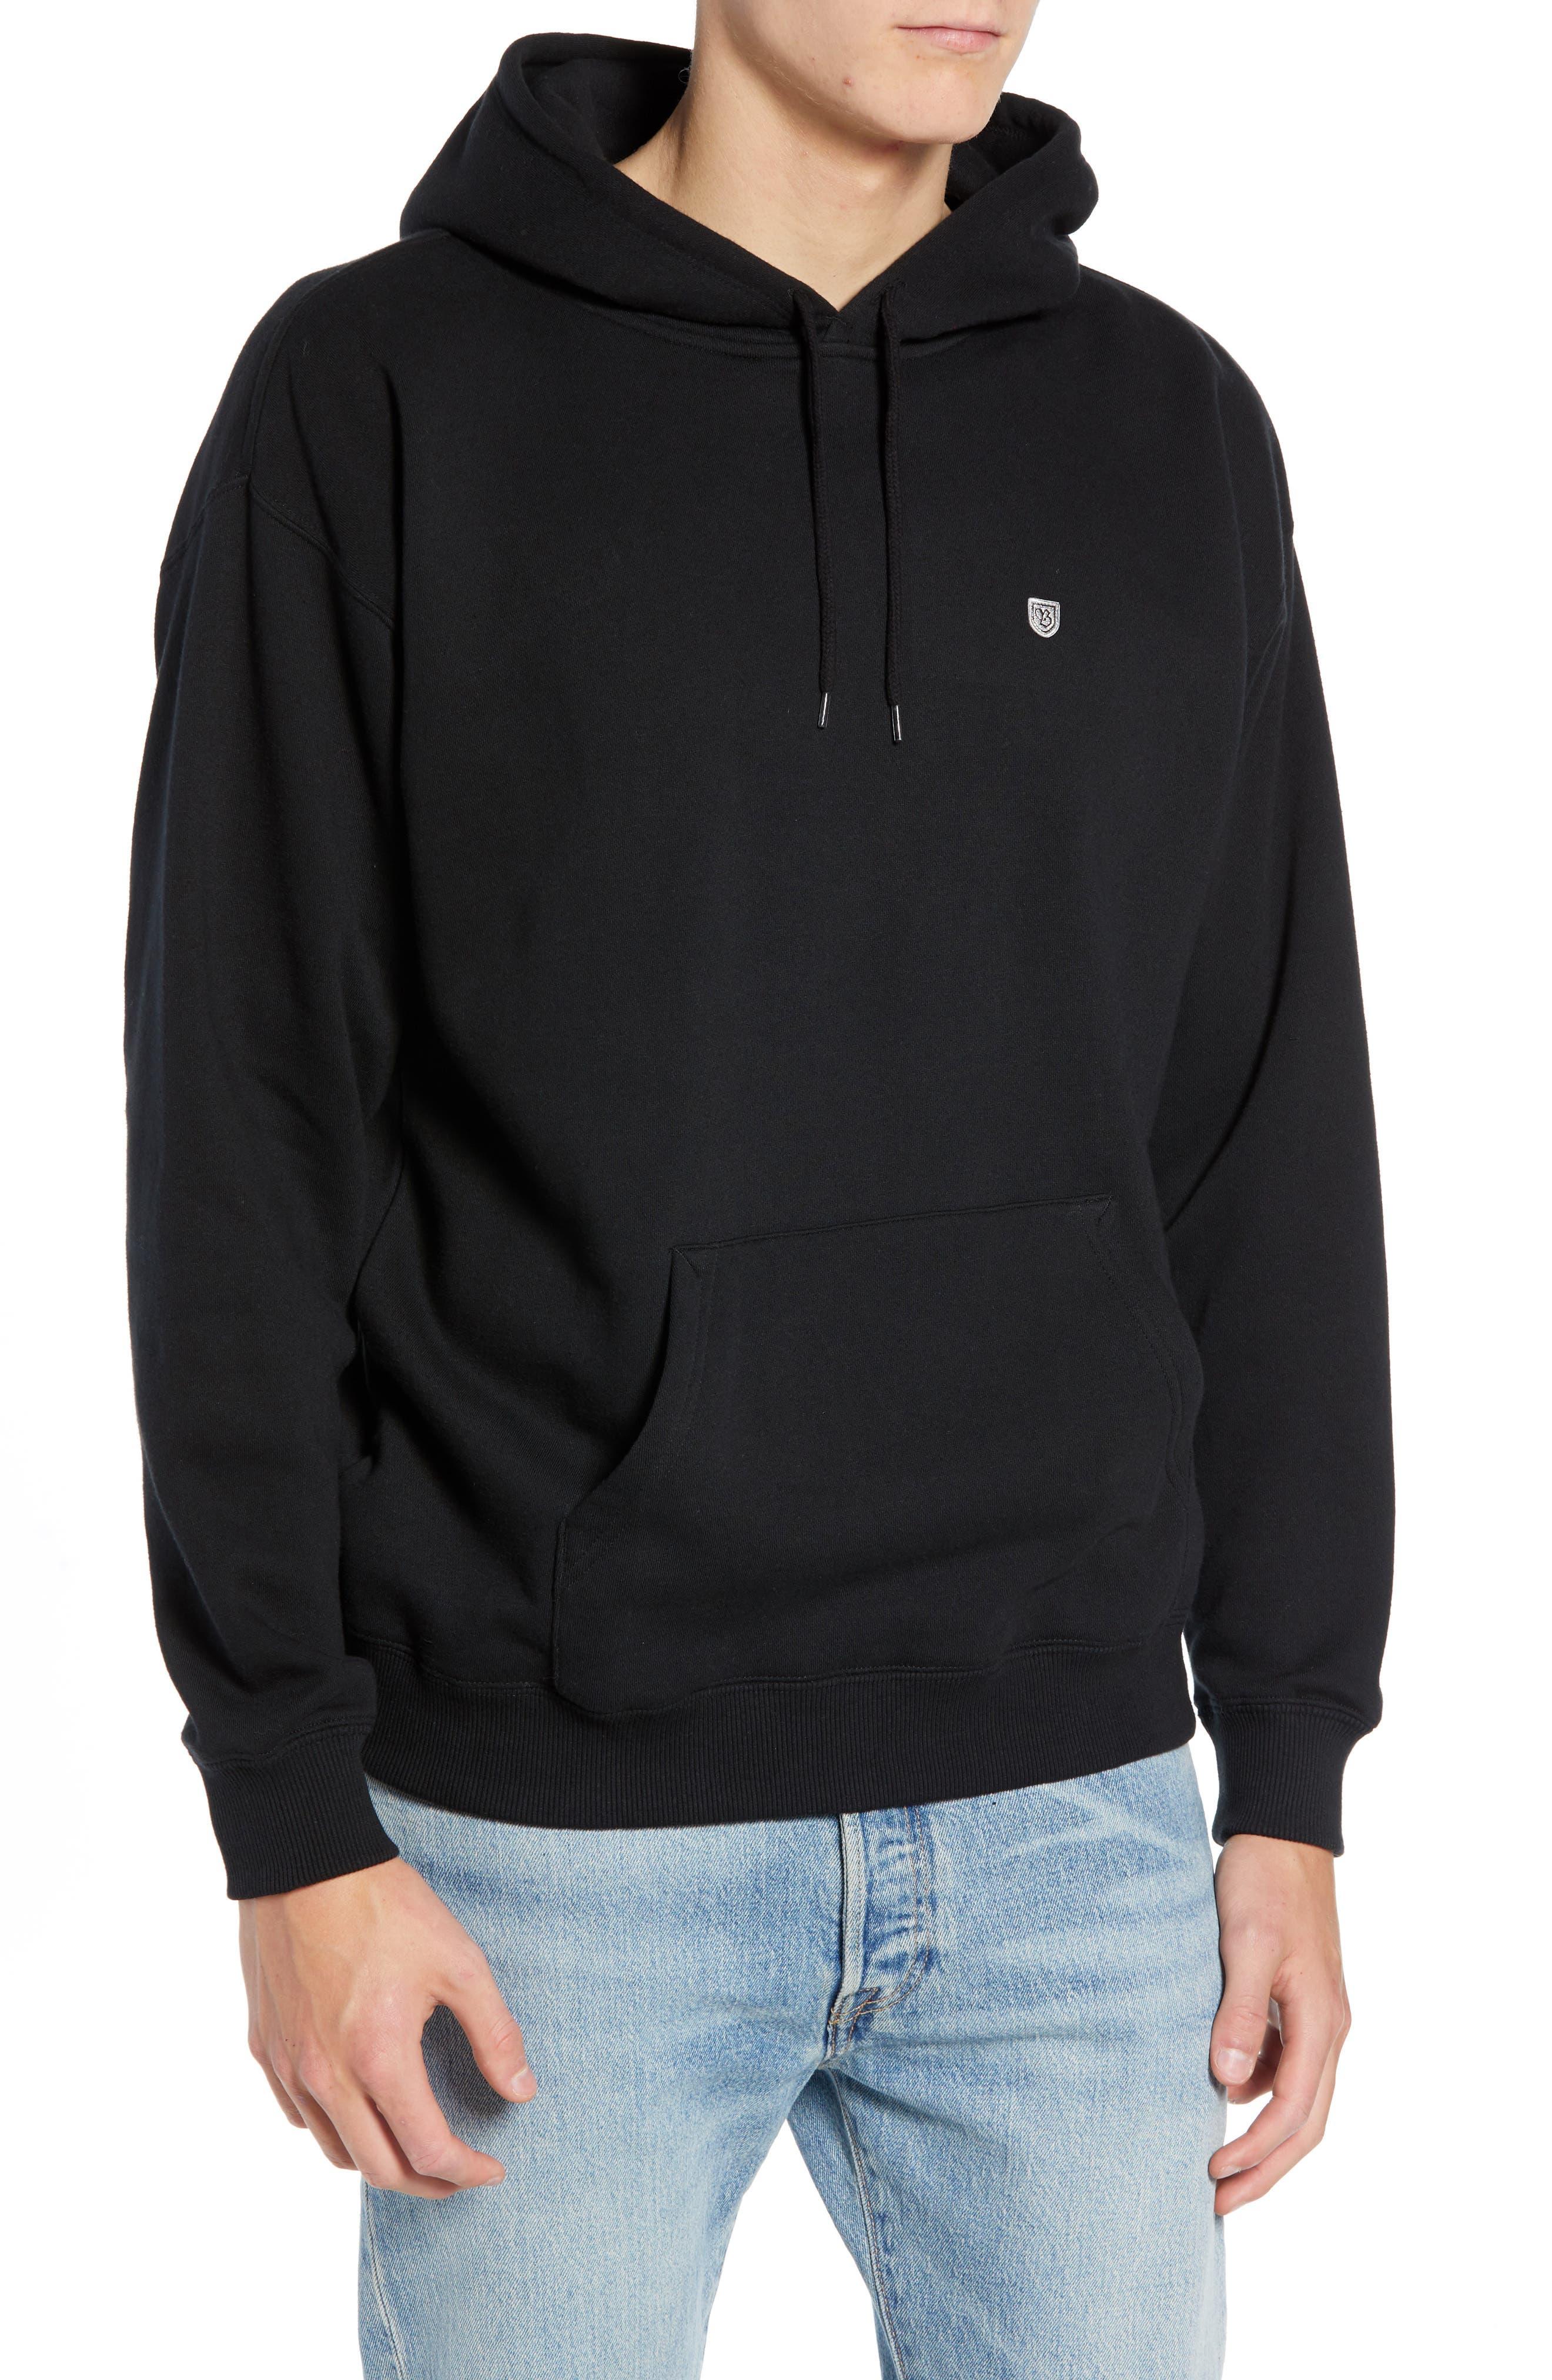 B-Shield Hooded Sweatshirt,                             Main thumbnail 1, color,                             001